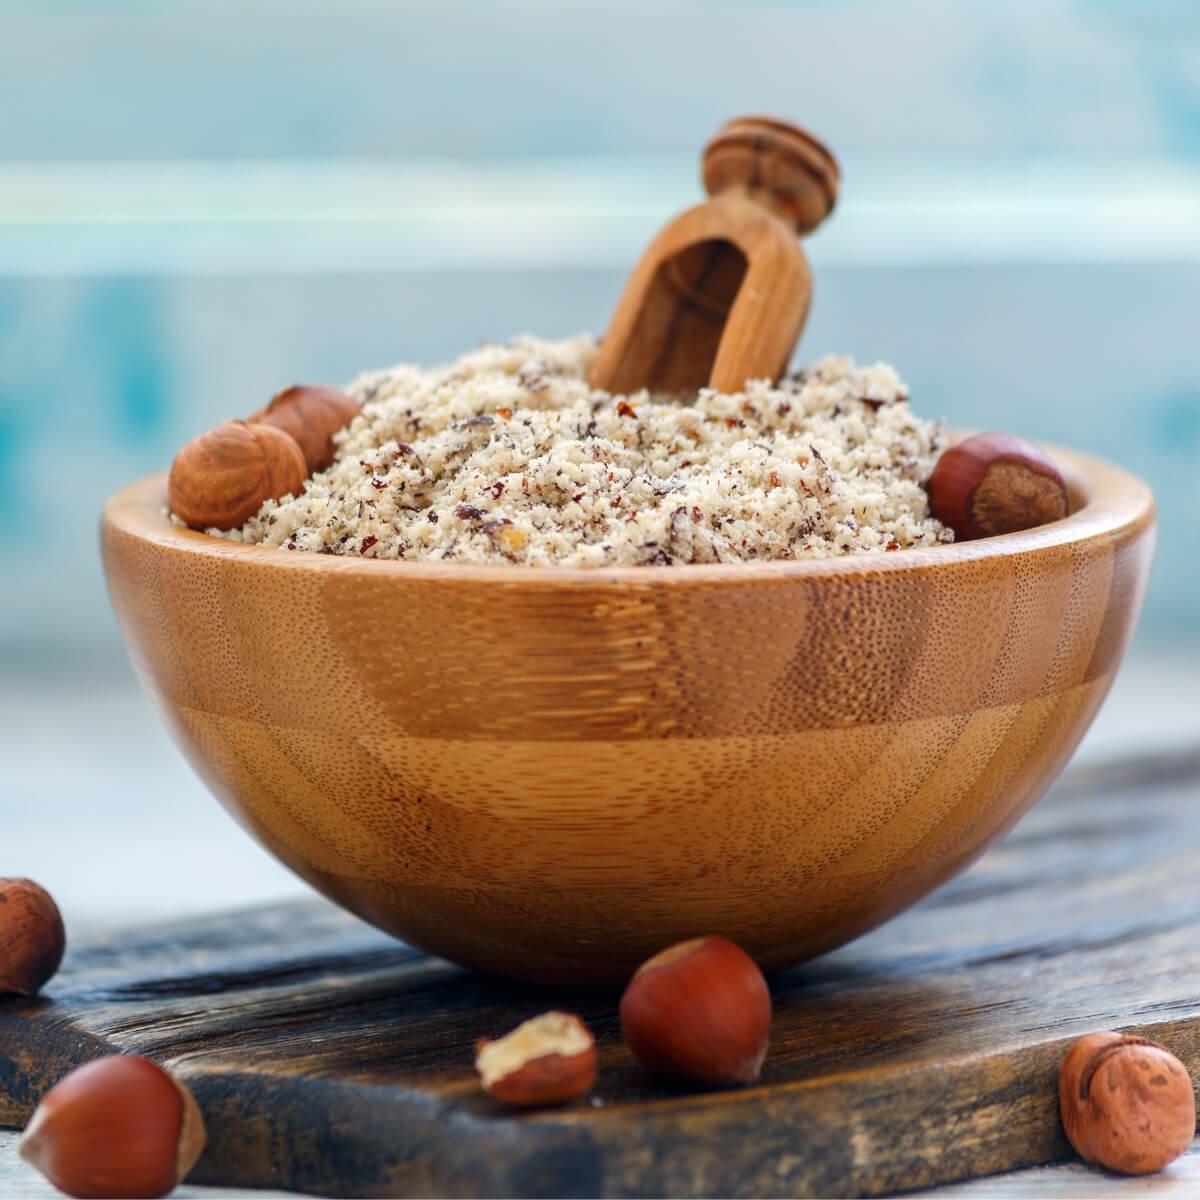 hazelnut flour in wood bowl